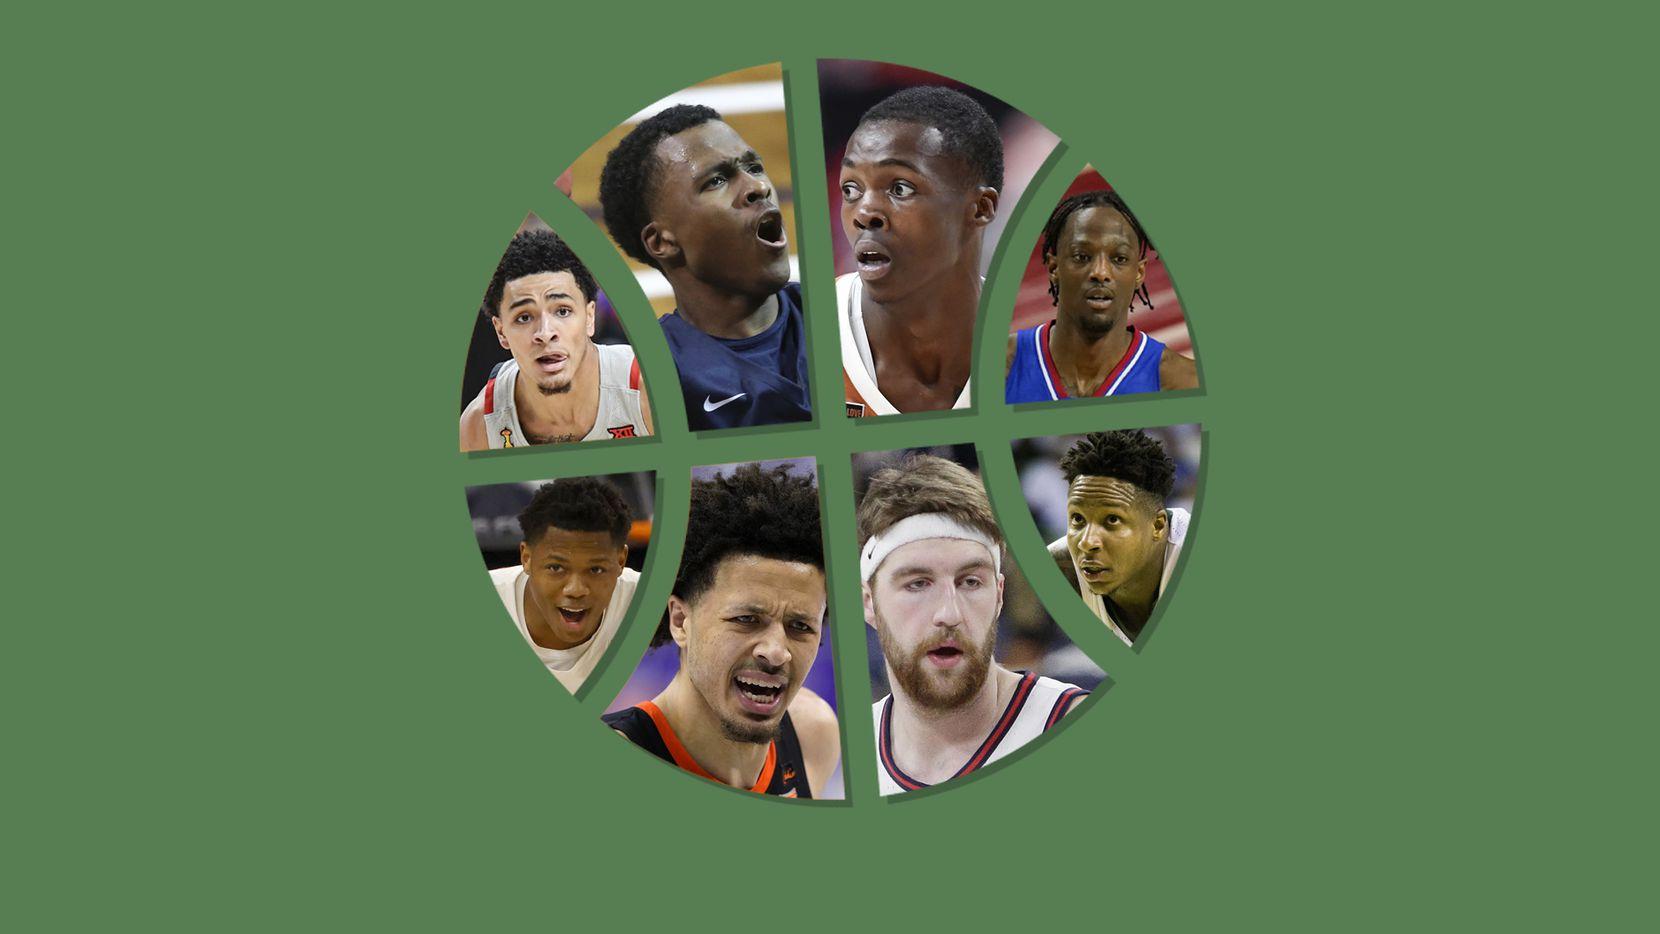 Clockwise starting in the top left: Micah Peavy, Max Abmas, Andrew Jones, Marcus Garrett, Mark Vital, Drew Timme, Cade Cunningham and Marcus Sasser.